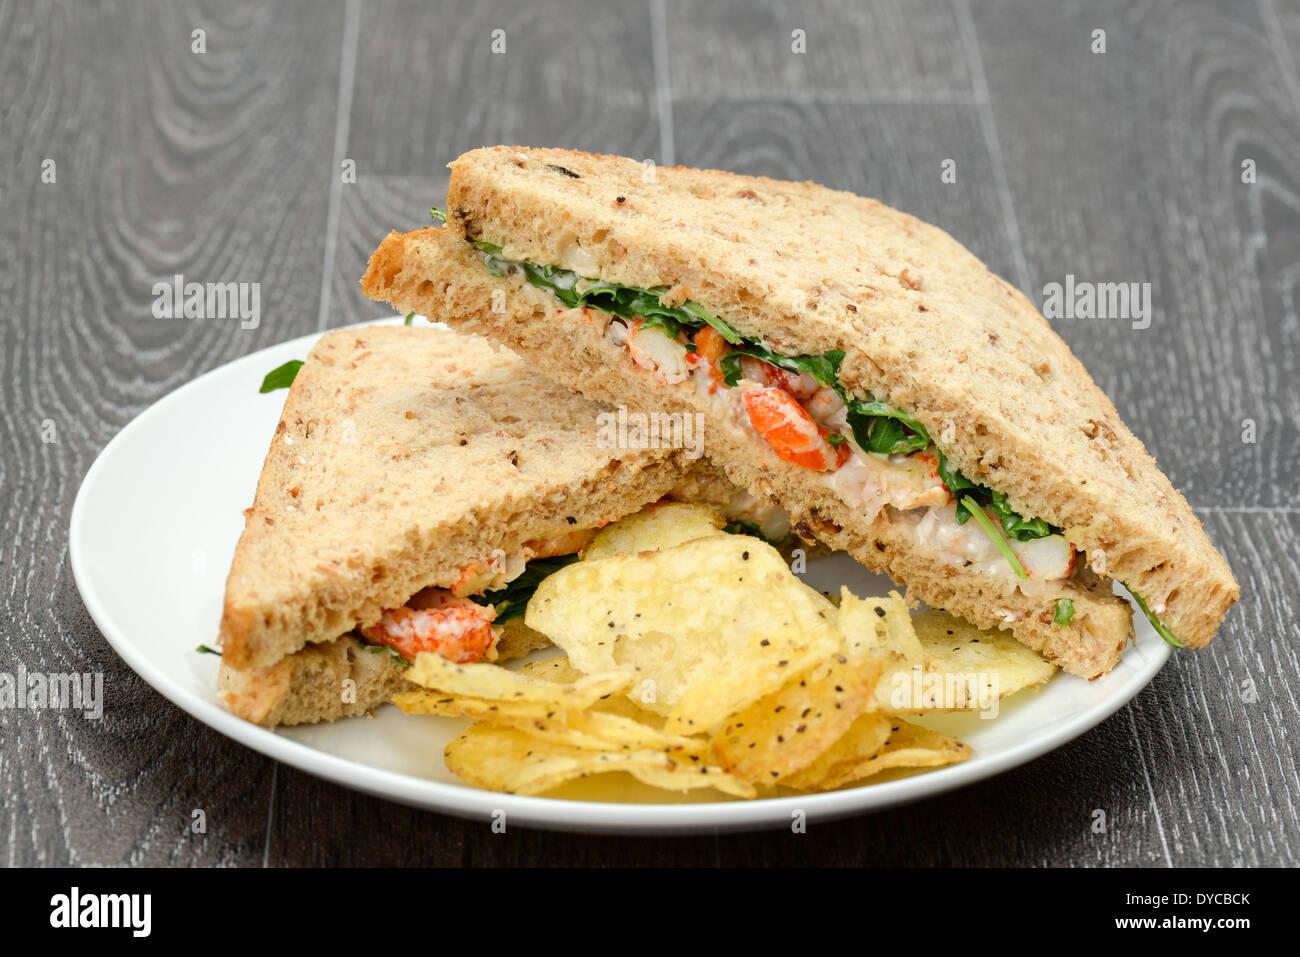 A crayfish and prawn sandwich with fresh rocket (aragula) and potato crisps on a white plate - studio shot - Stock Image